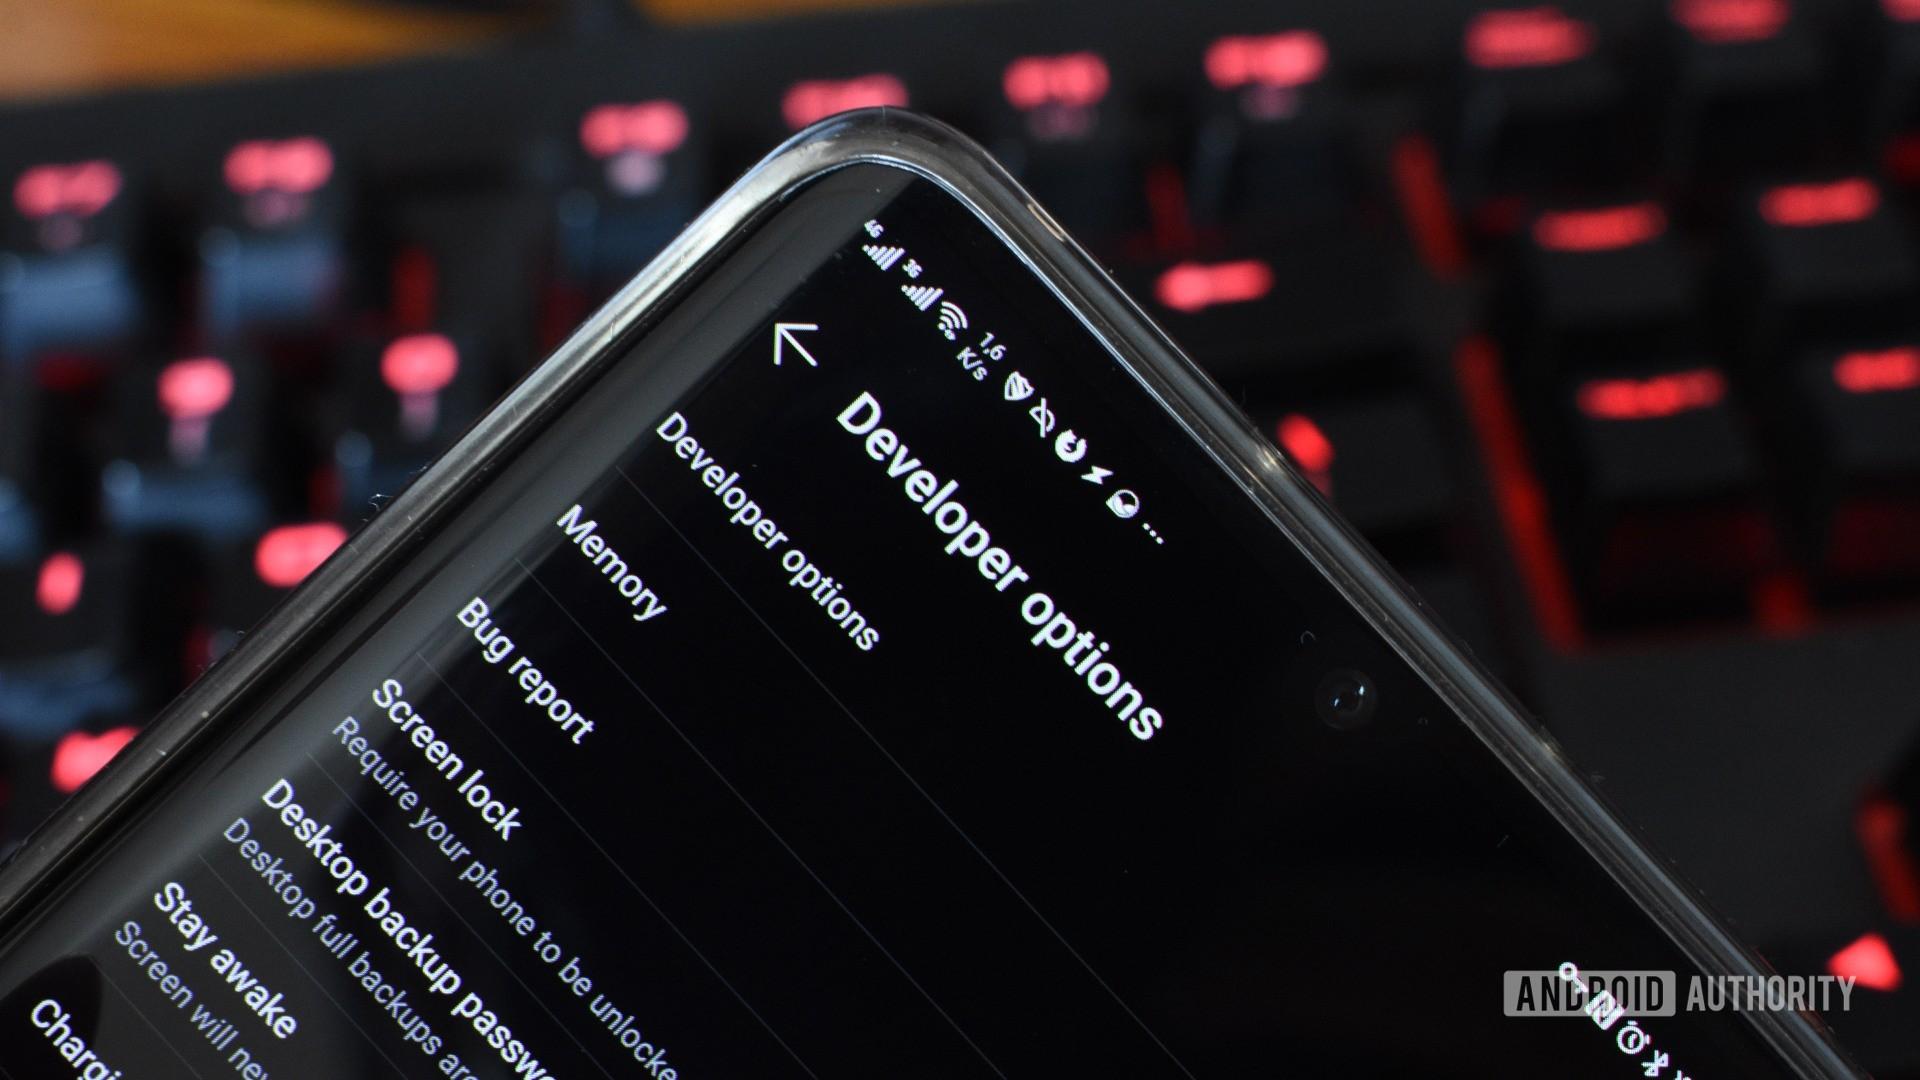 android developer options menu